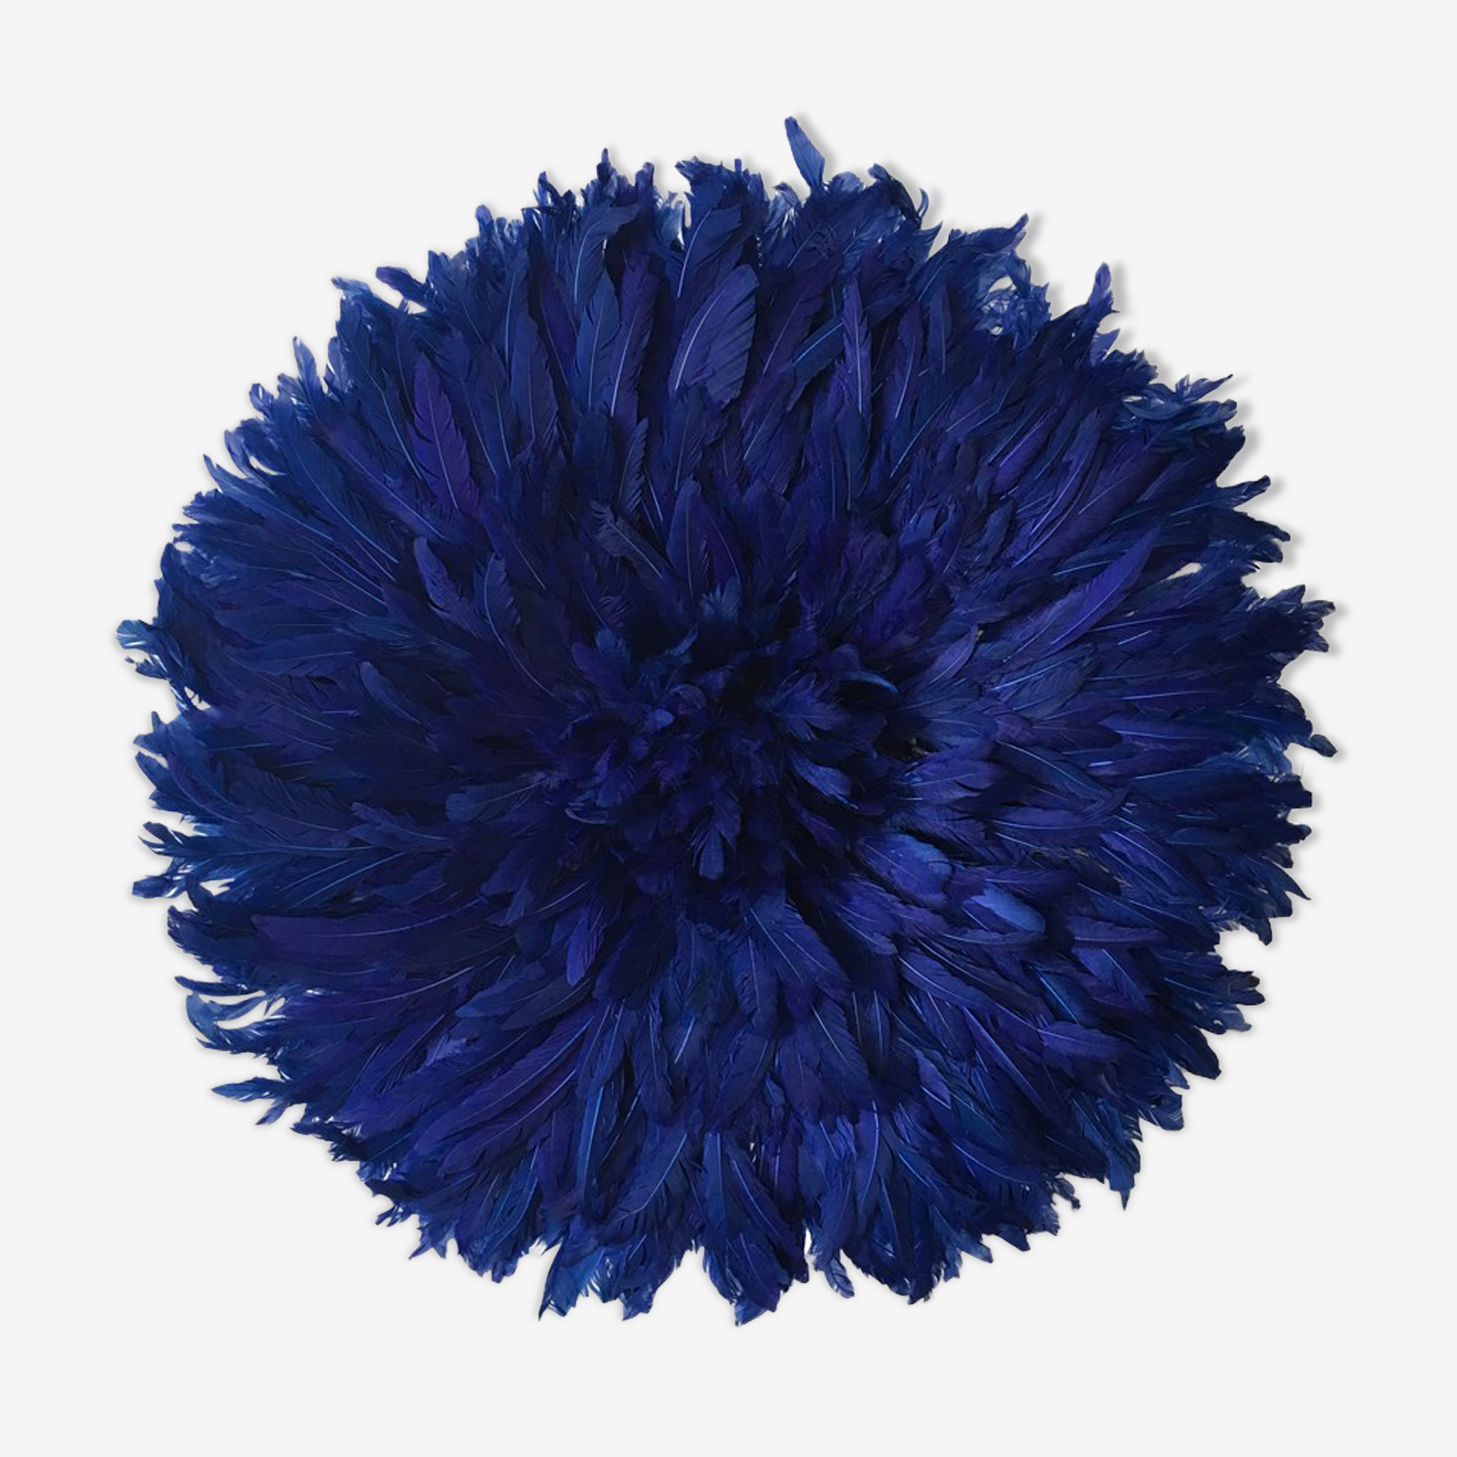 Juju hat bleu nuit 75cm